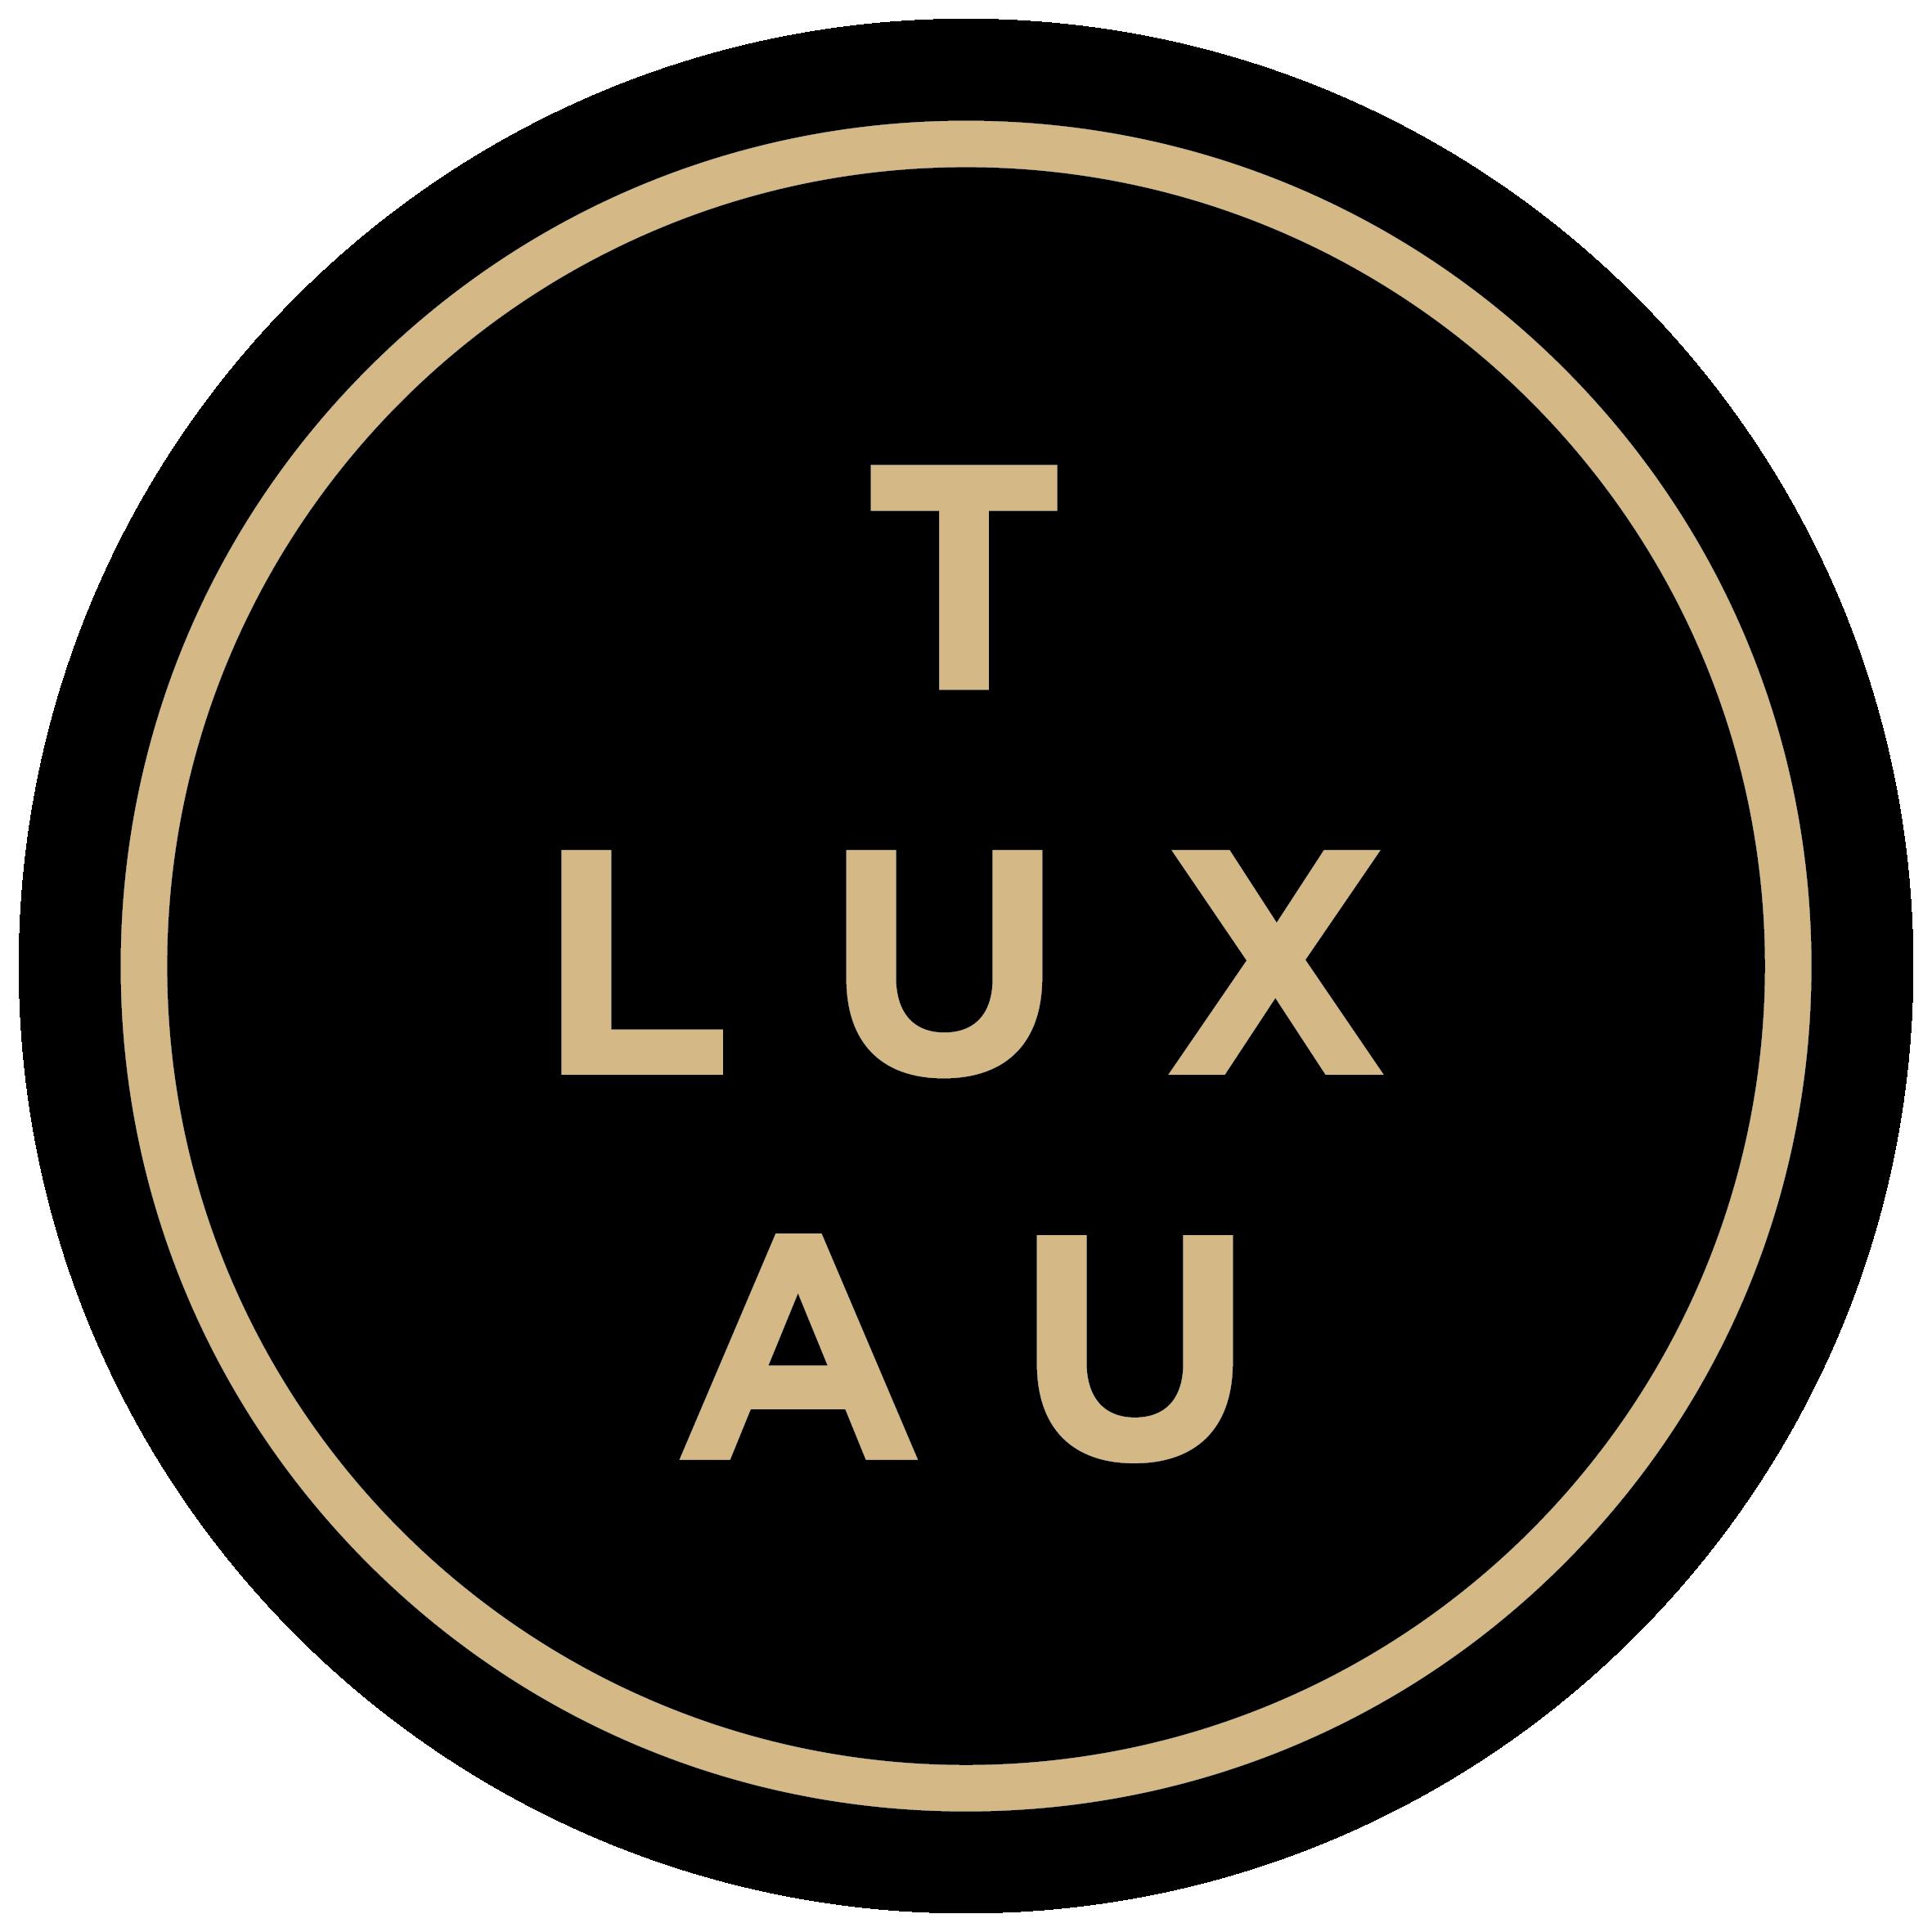 Tluxau